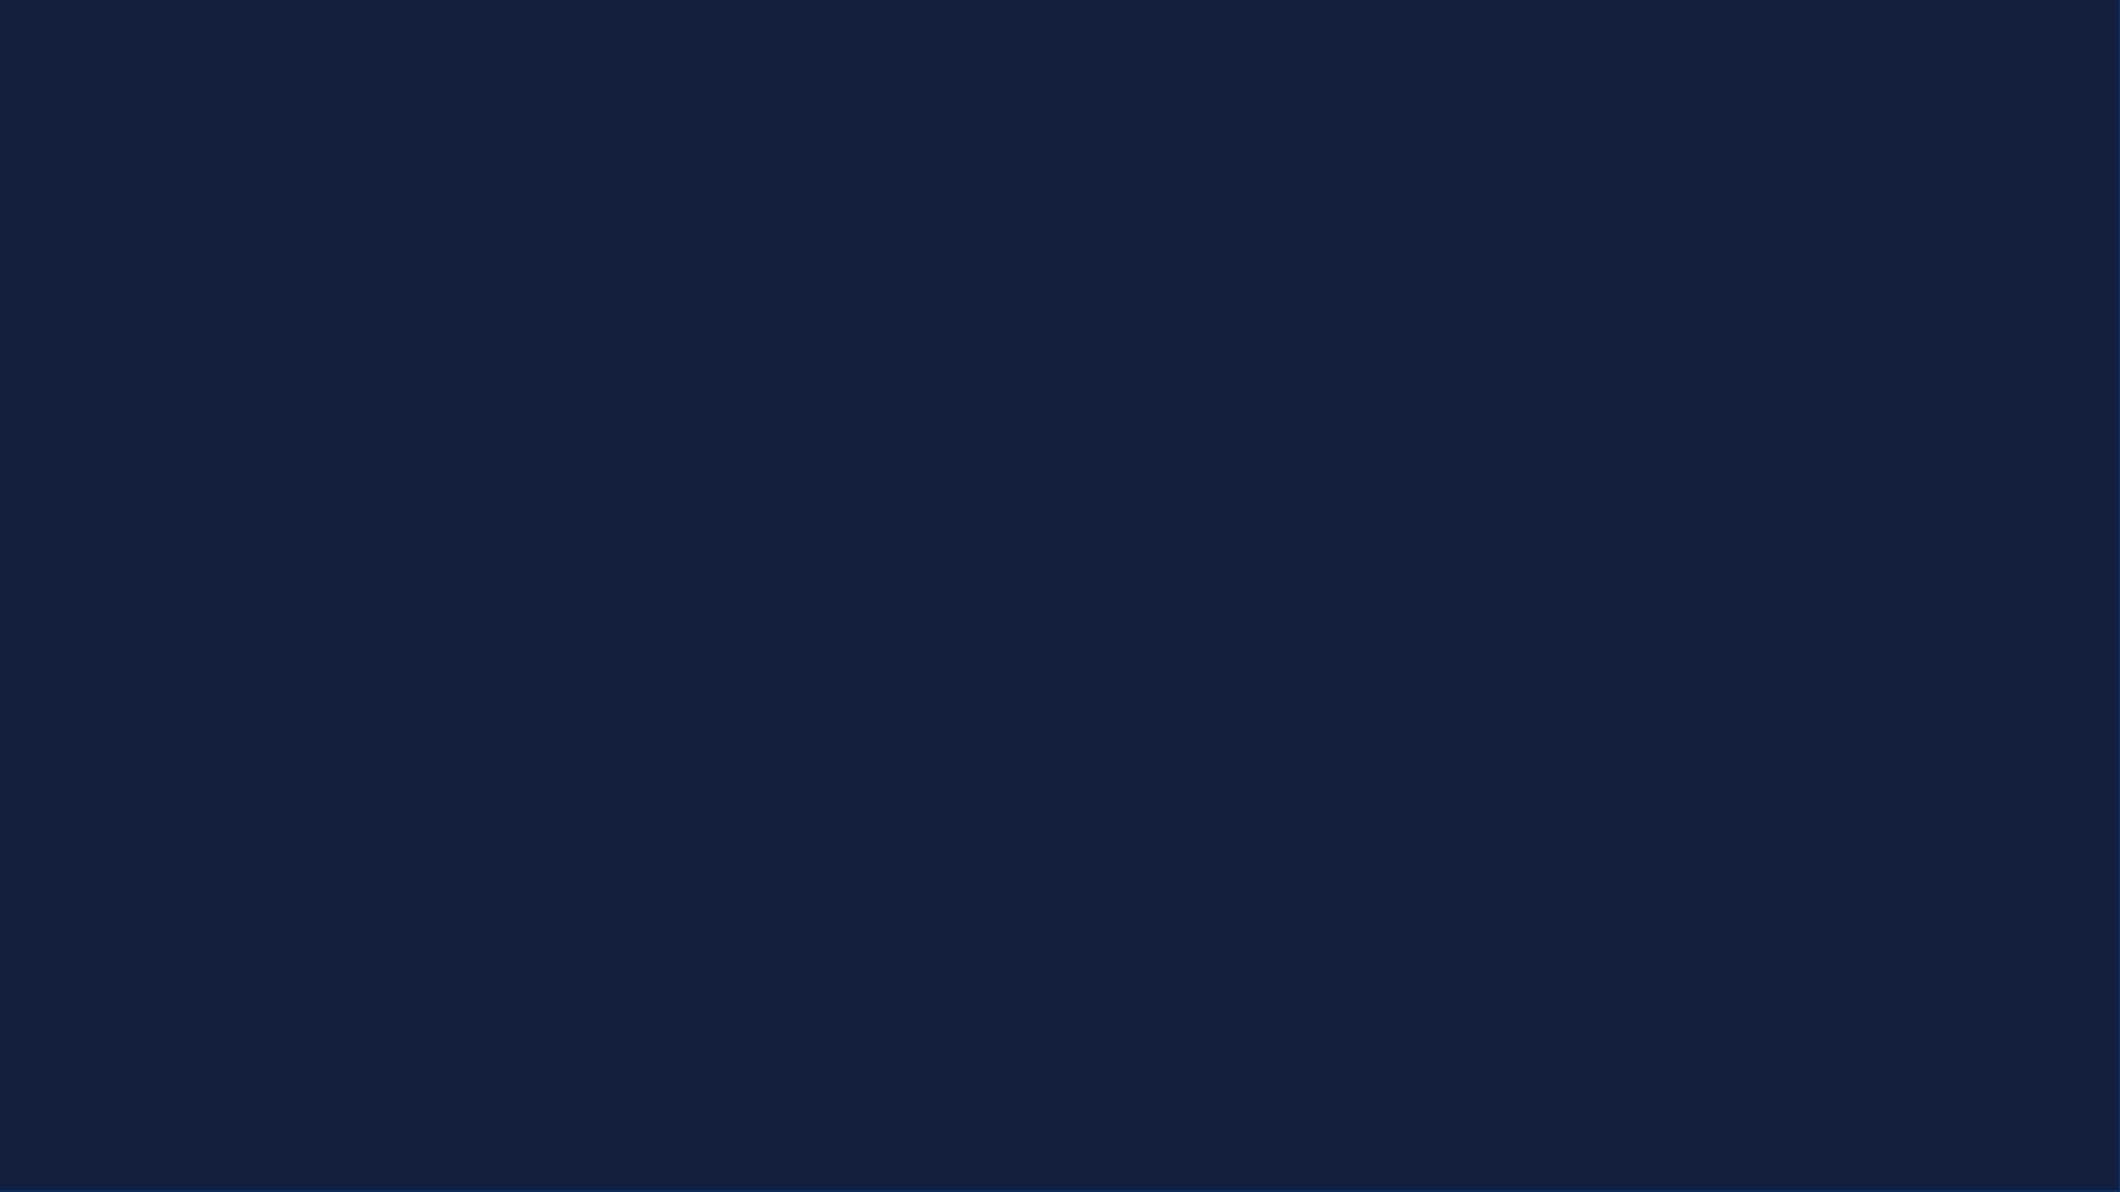 Navy Blue Backgrounds 2120x1192